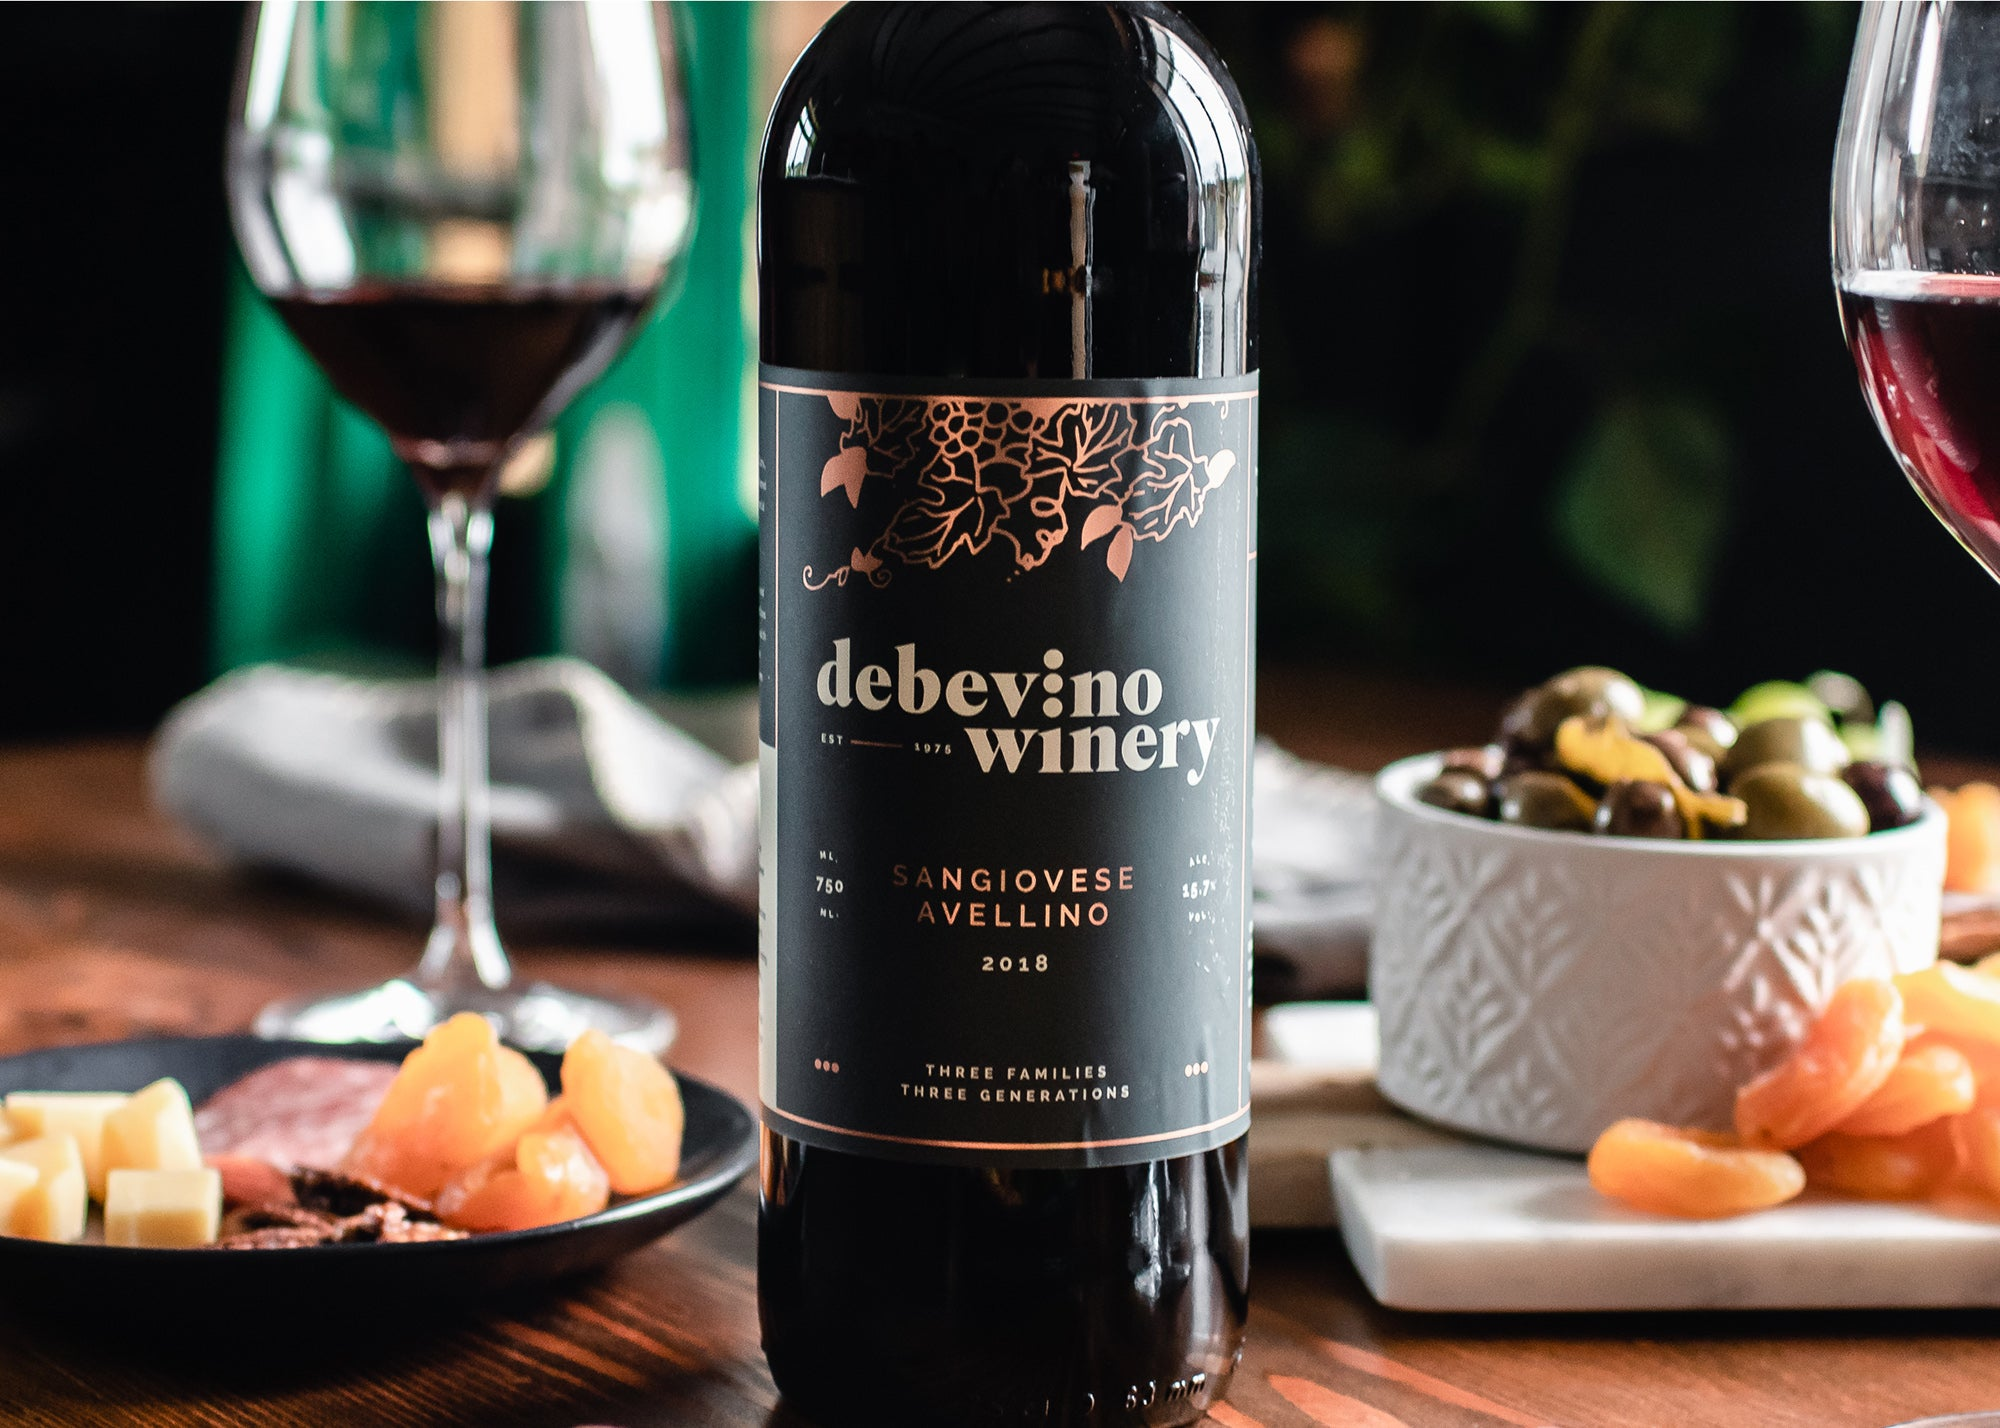 Debevino Winery